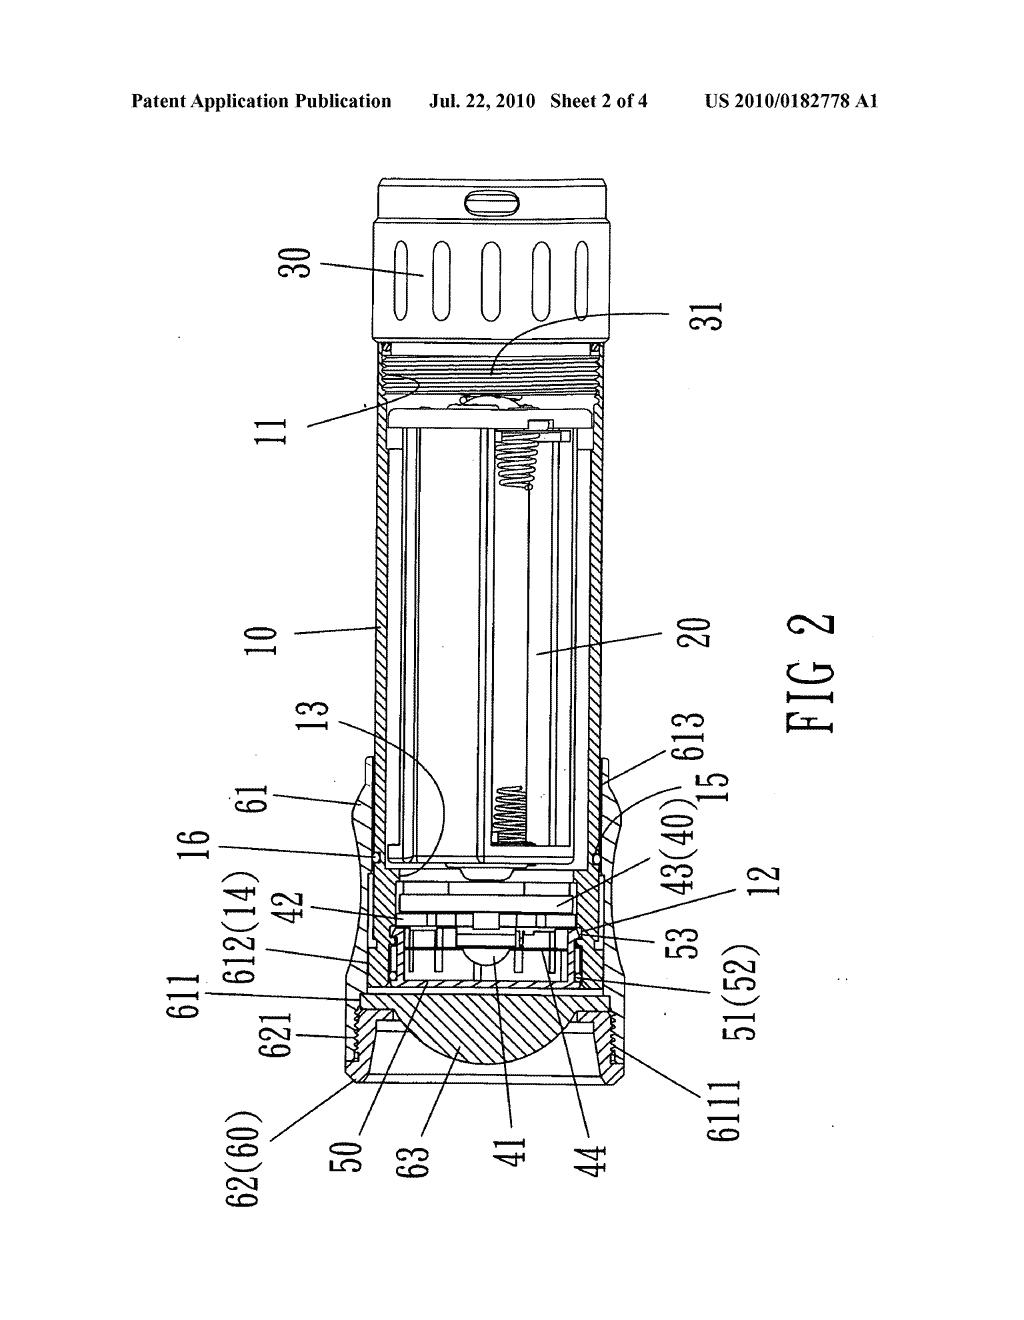 Wiring Diagram PDF: 2003 Jeep Liberty Fuse Box